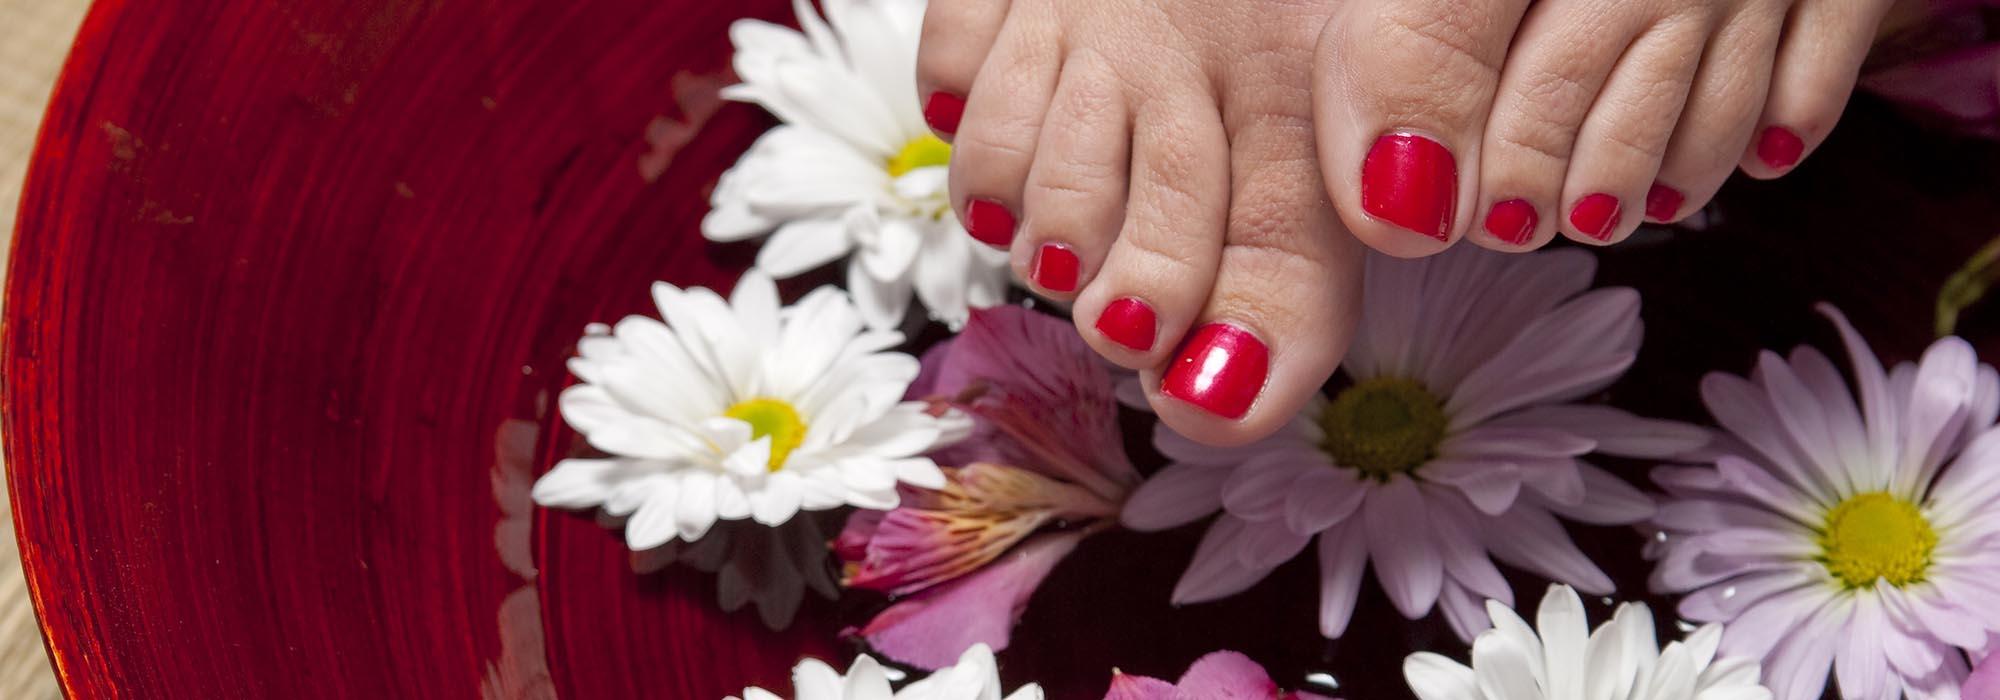 foot-1885546-pixabay